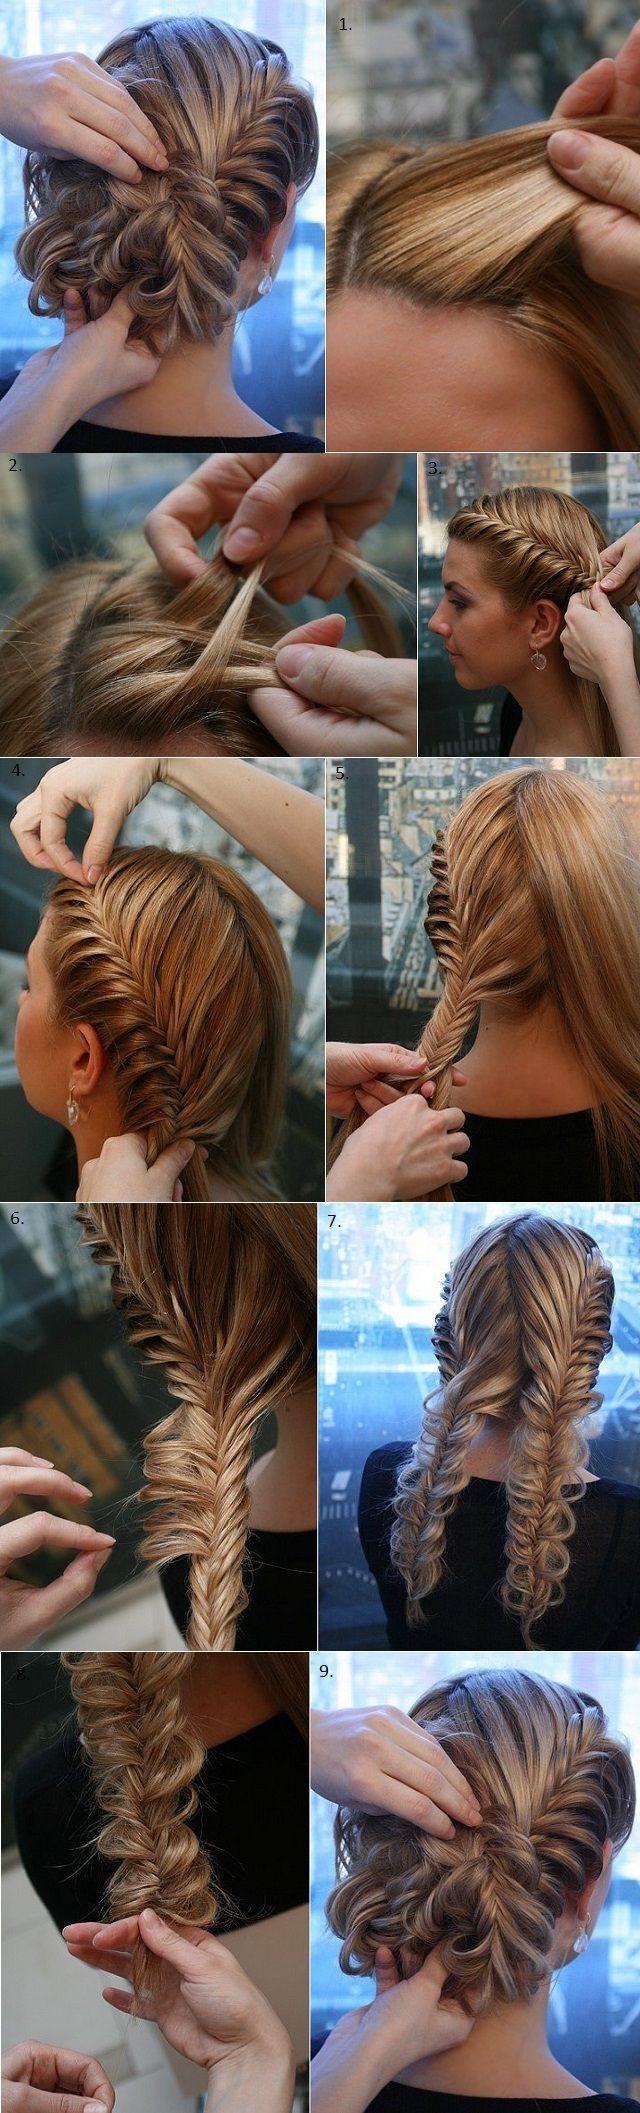 20 cute and easy braided hairstyle tutorials   diy hair care